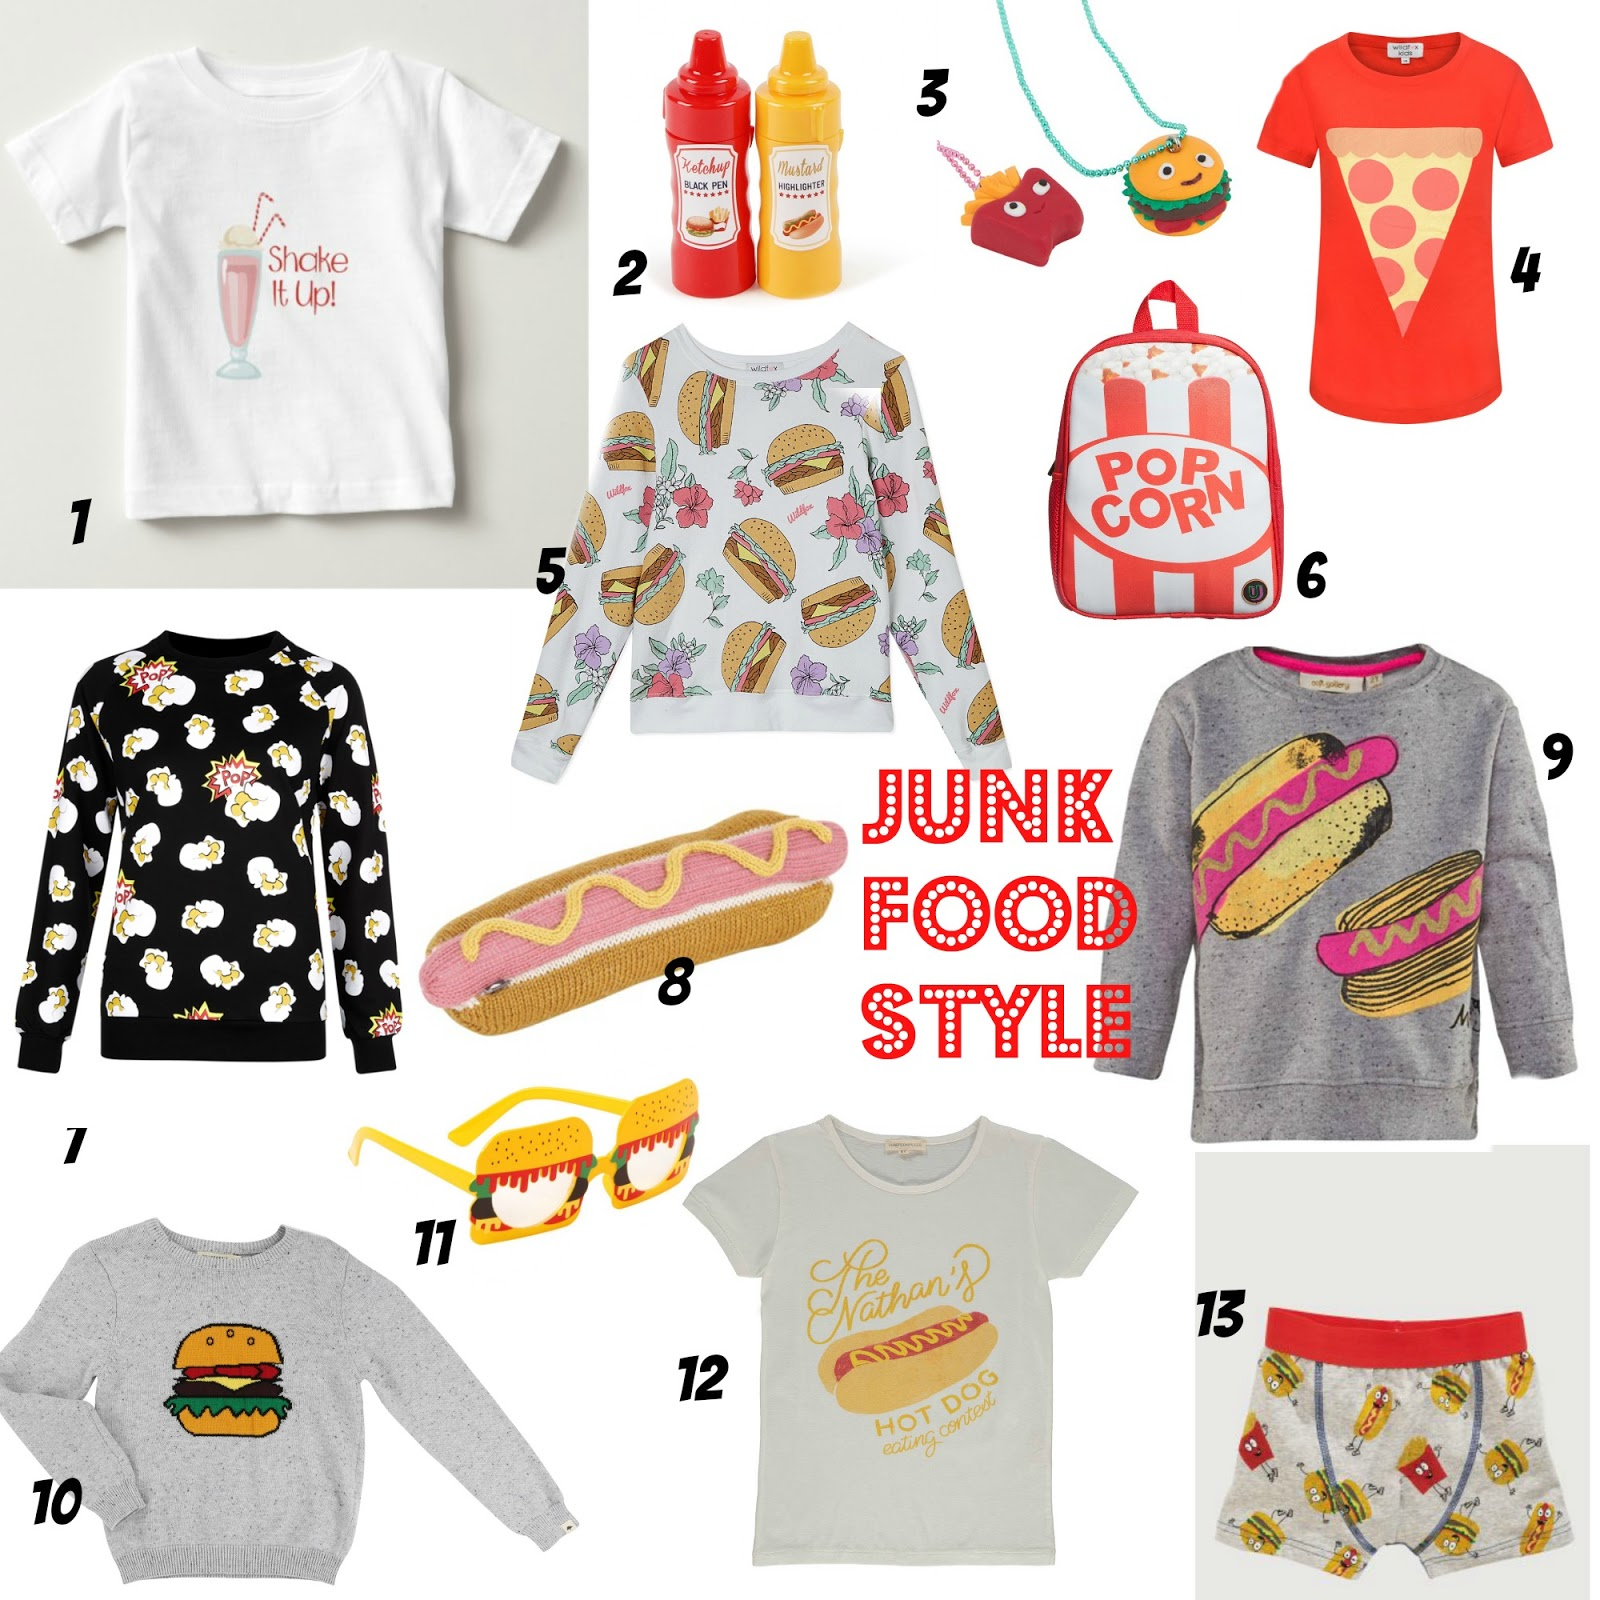 mamasVIB, V. I. BUYS: Fast Food with a side of fashion - junk food gets chic!, hamburger prints, junk food fashion,kids fashion, ho dog prints, kid trends, moschino, mcdonalds fashion, fast food, junk food, popcorn print, milkshake print, hotdog party stall, pizza cake, hamburger cupcakes, mamasvib, fashion